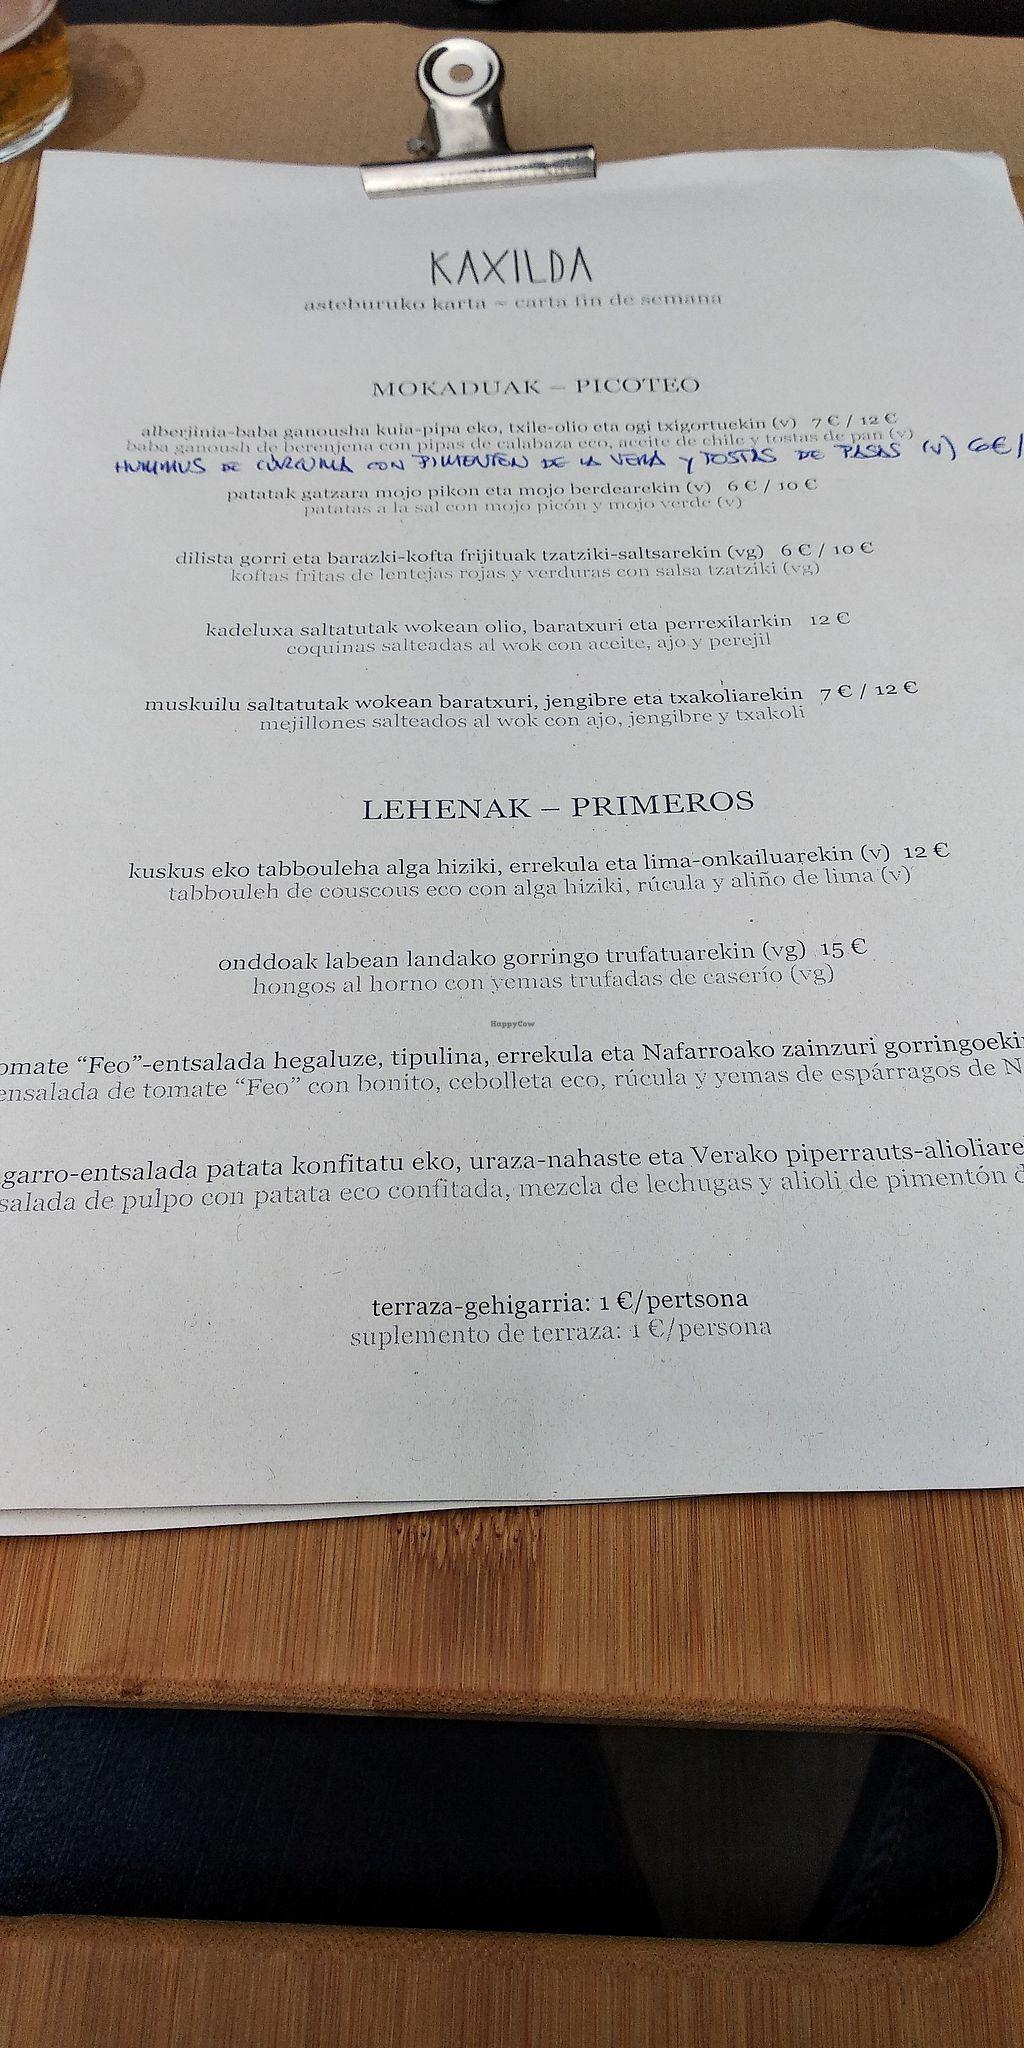 Kaxilda San Sebastian Restaurant Happycow